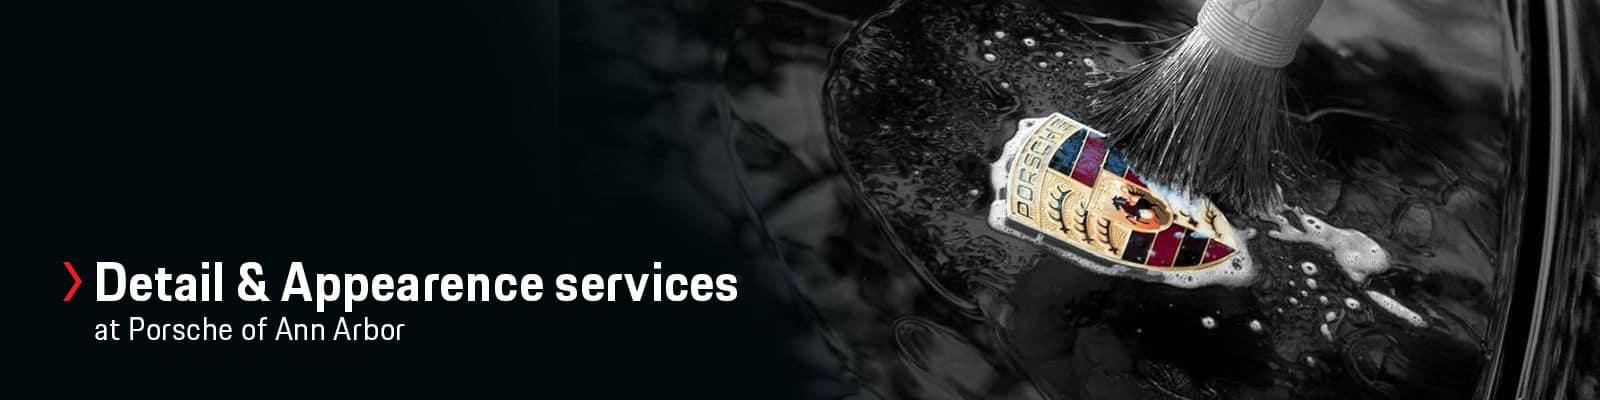 Porsche Ann Arbor Detail Service Packages